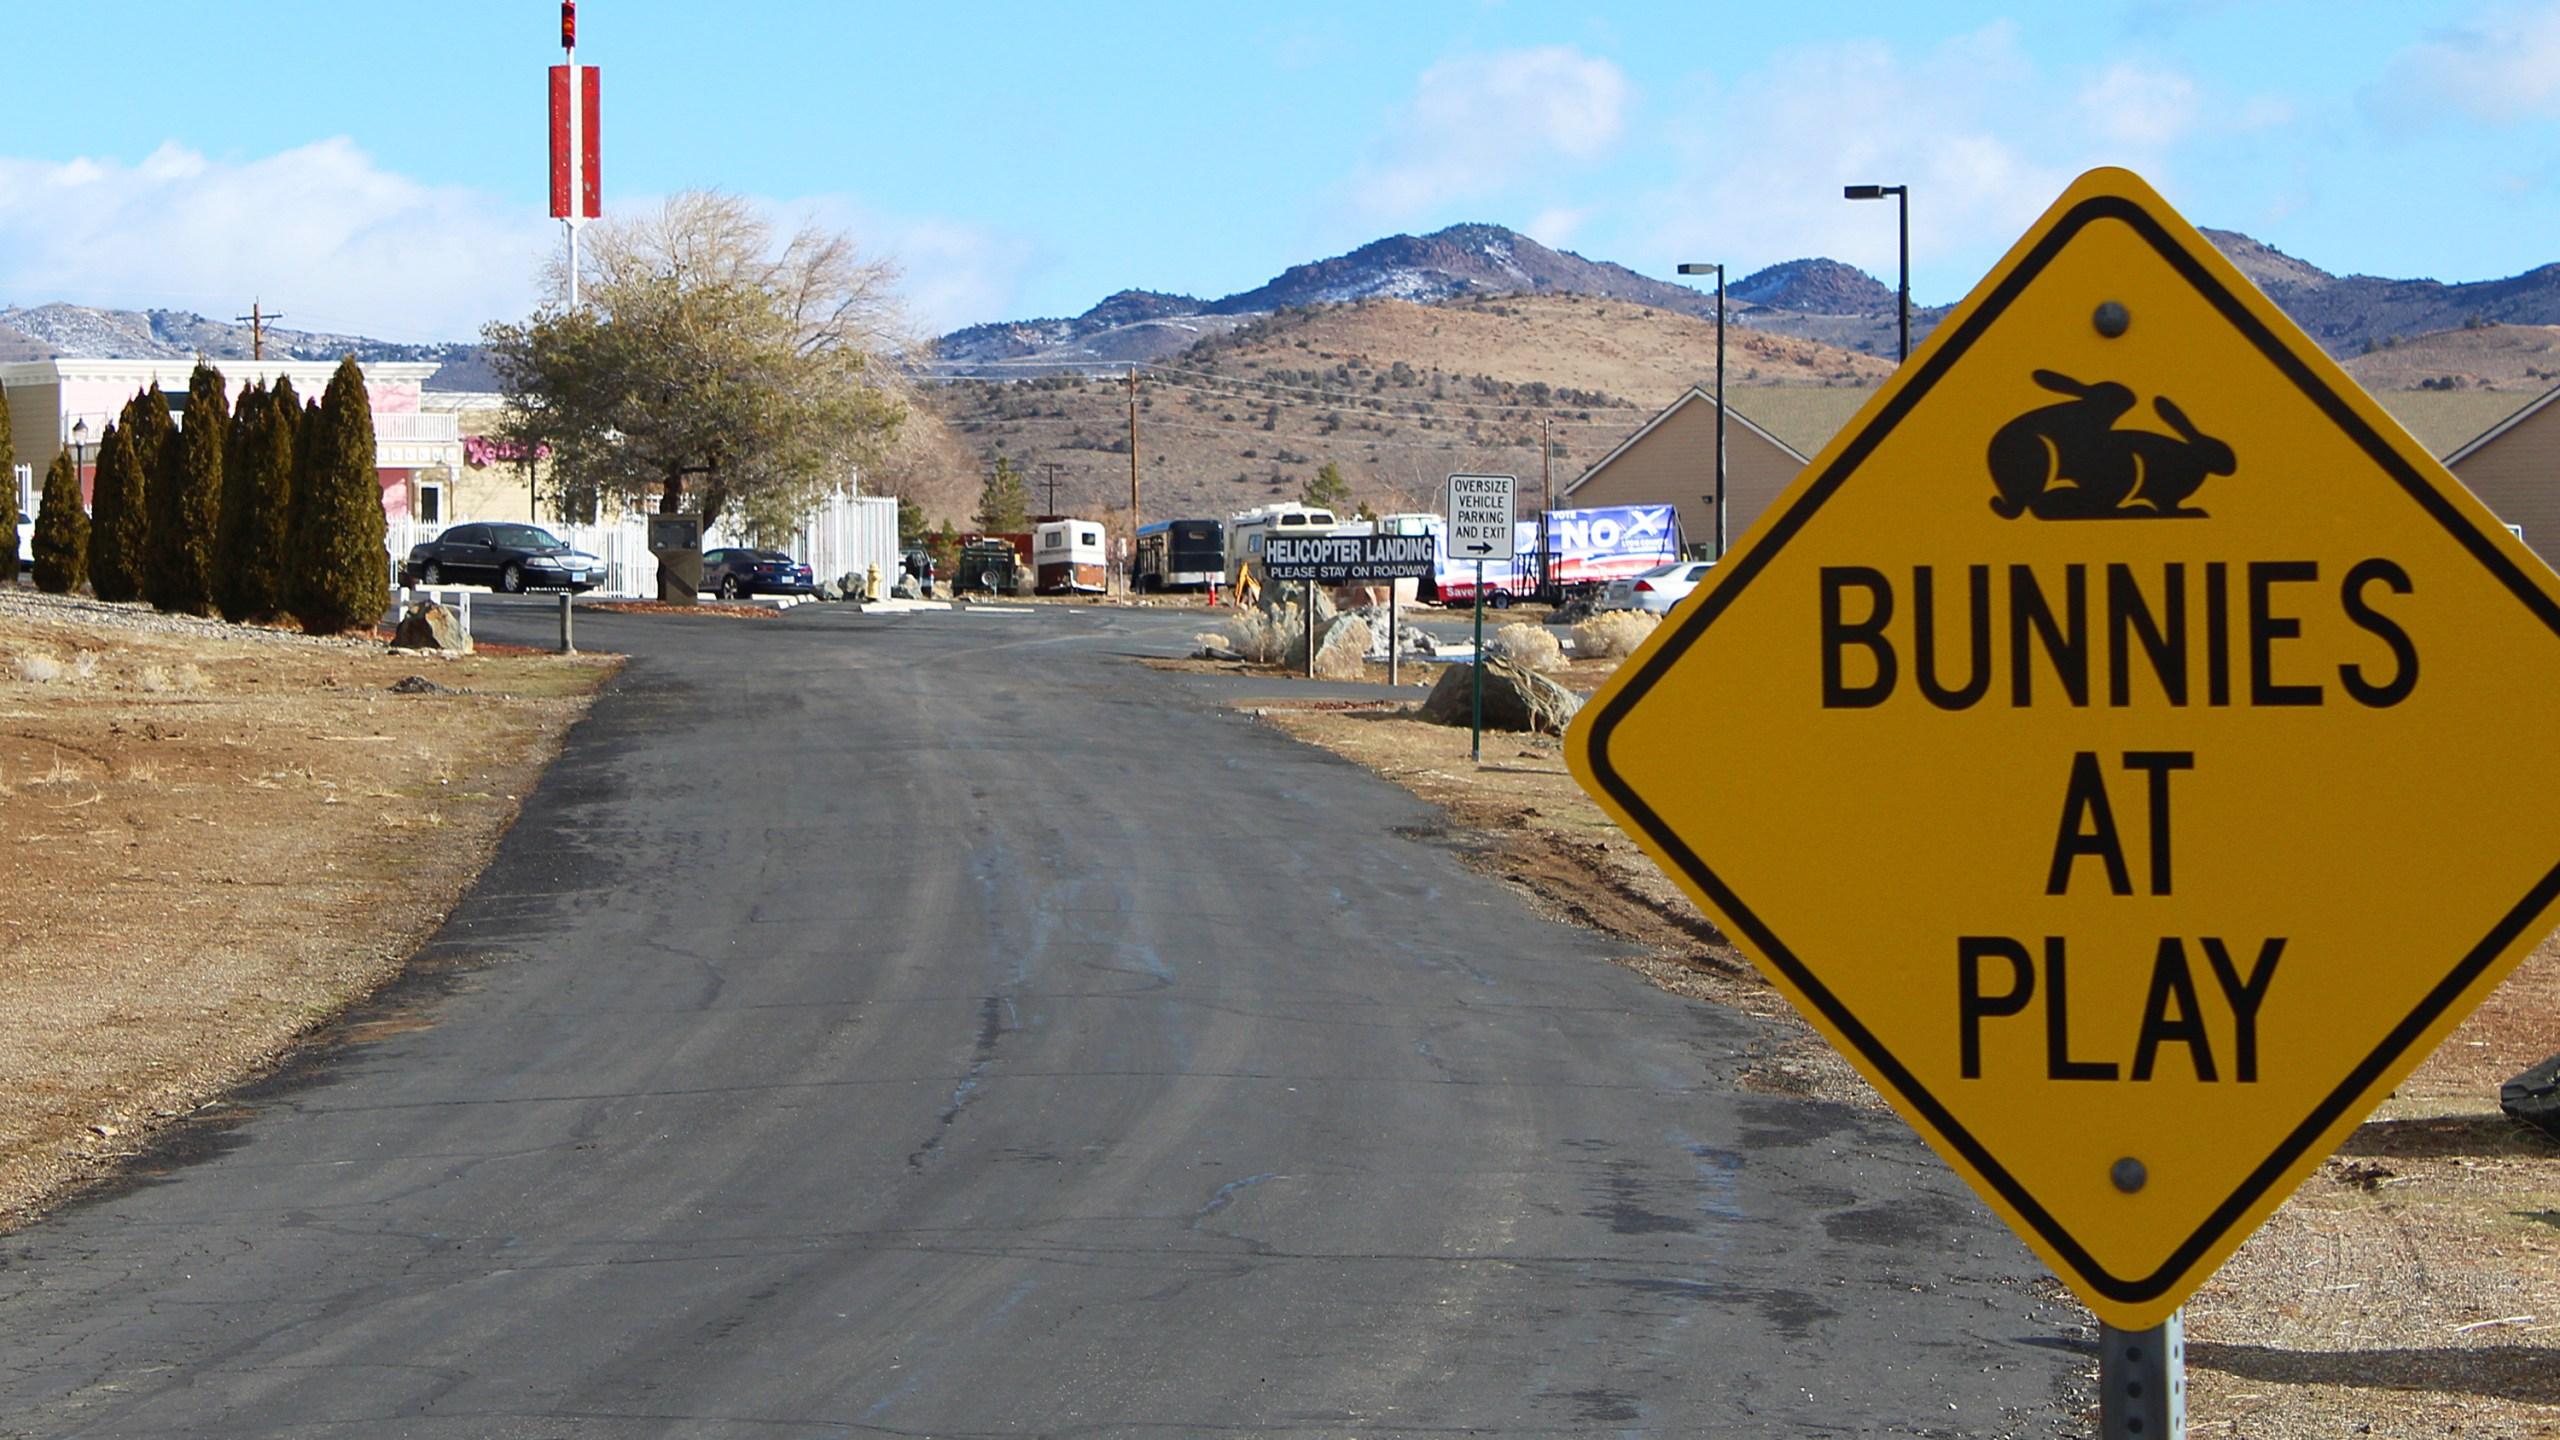 Coronavirus pandemic makes sex work taboo in Nevada's legal brothels | KTLA